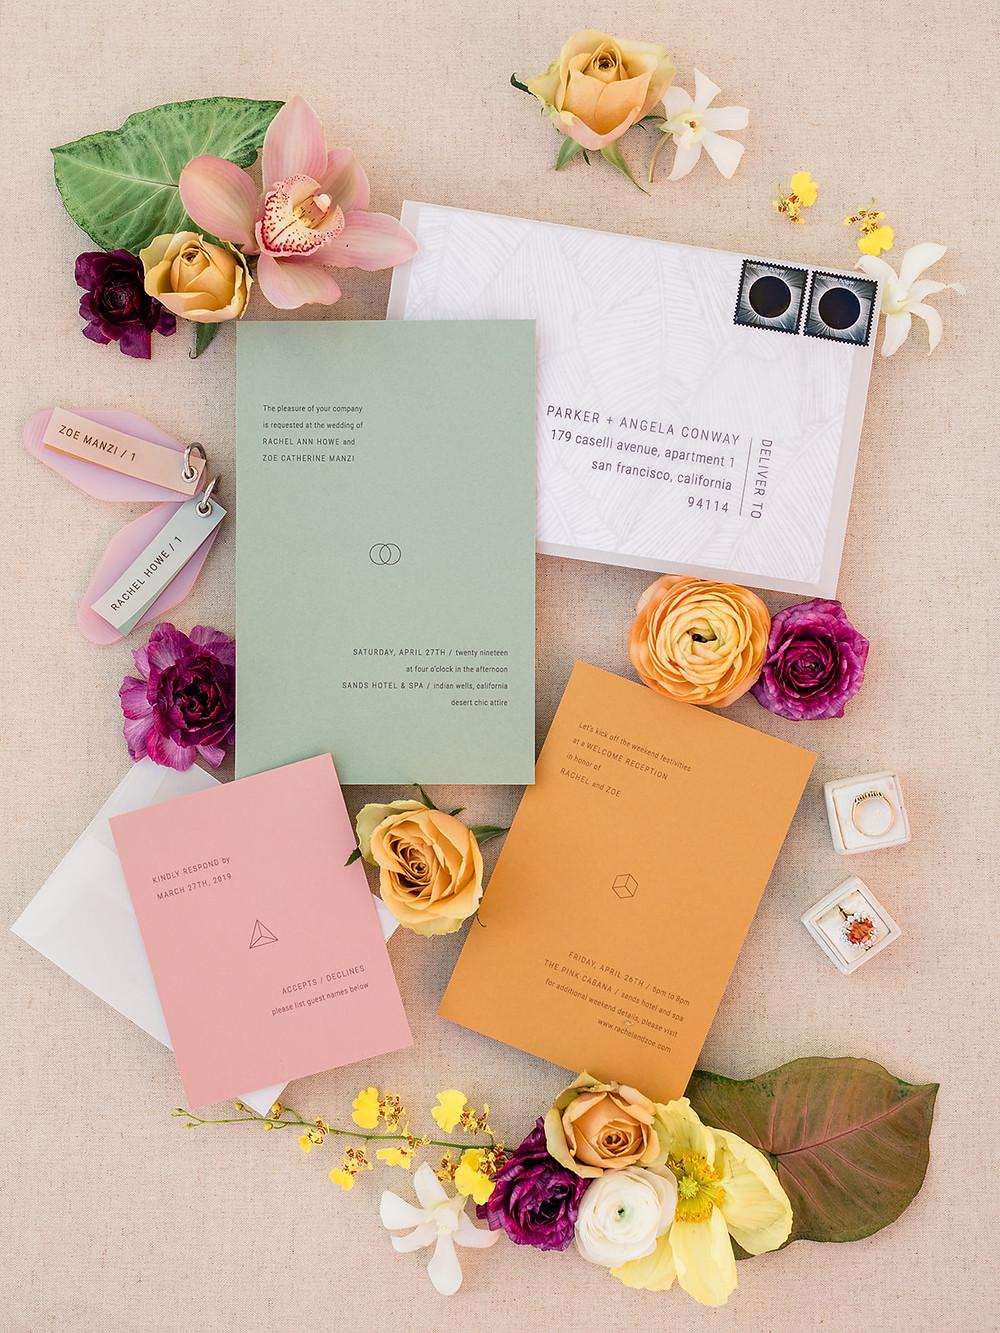 Modern Moroccan Desert Glam Editorial - LGBTQ Wedding Editoiral - Wedding Design Inspiration - Muted Desert Tones - Modern Glam Jungle Chic - Invitation Suite